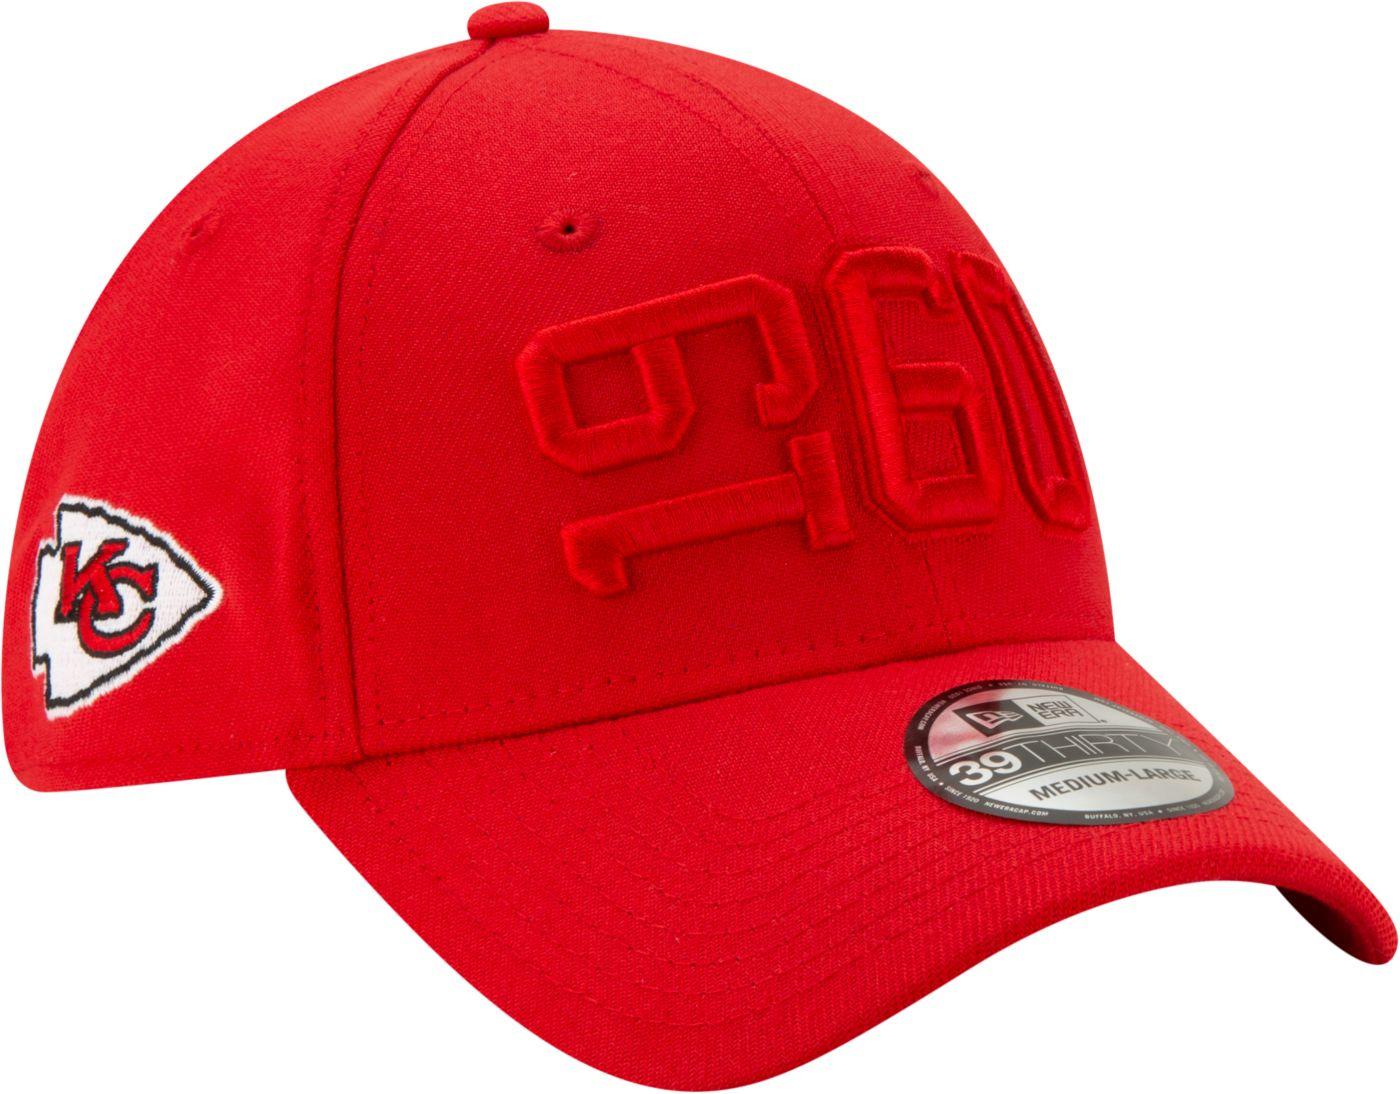 New Era Men's Kansas City Chiefs Sideline Color Rush 39Thirty Stretch Fit Hat